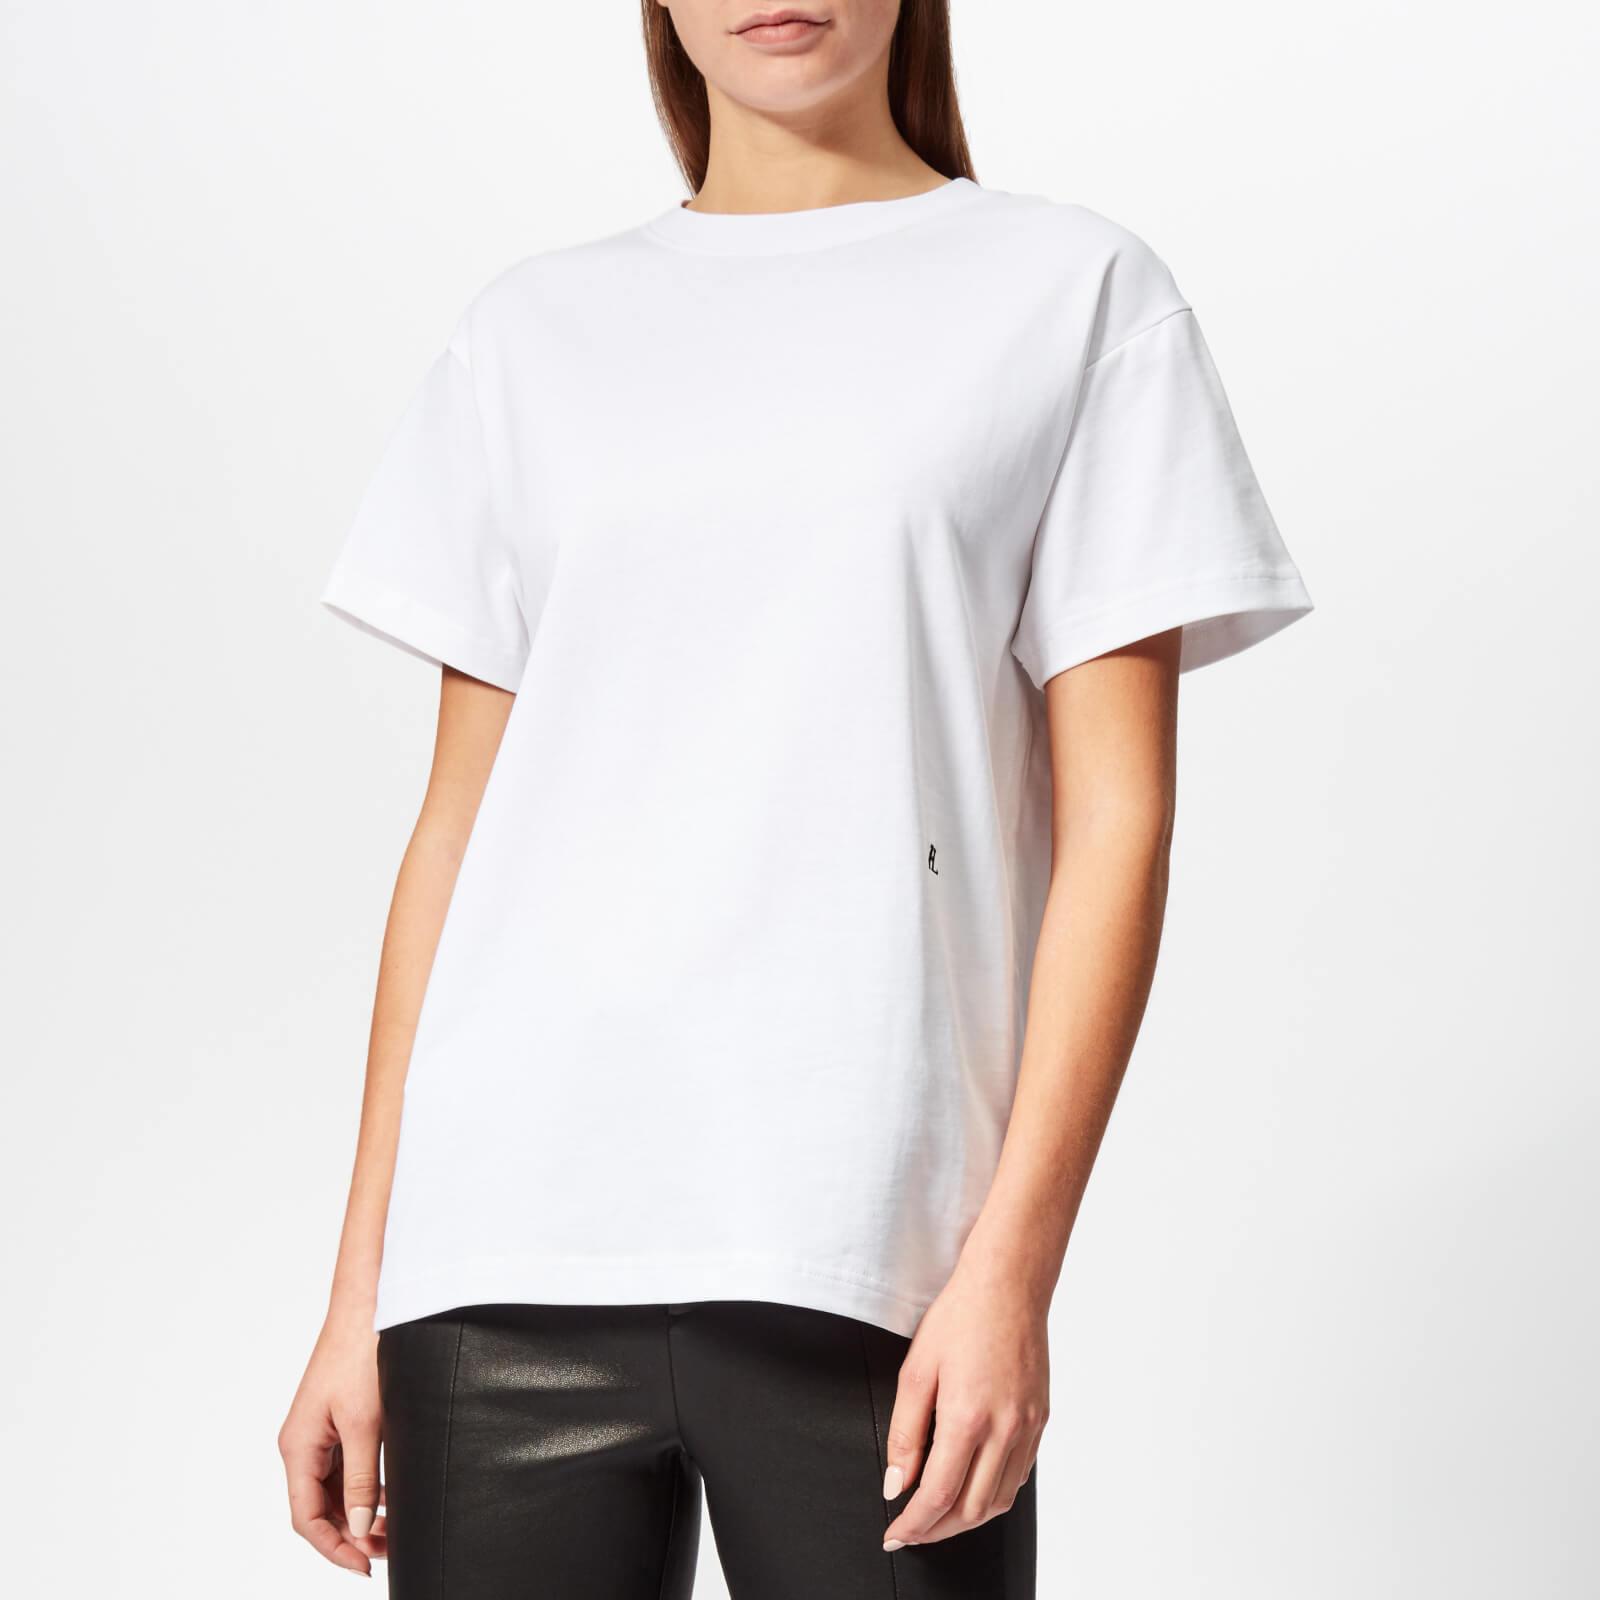 3e4e489c Helmut Lang Women's HL Logo T-Shirt Military - White - Free UK Delivery  over £50